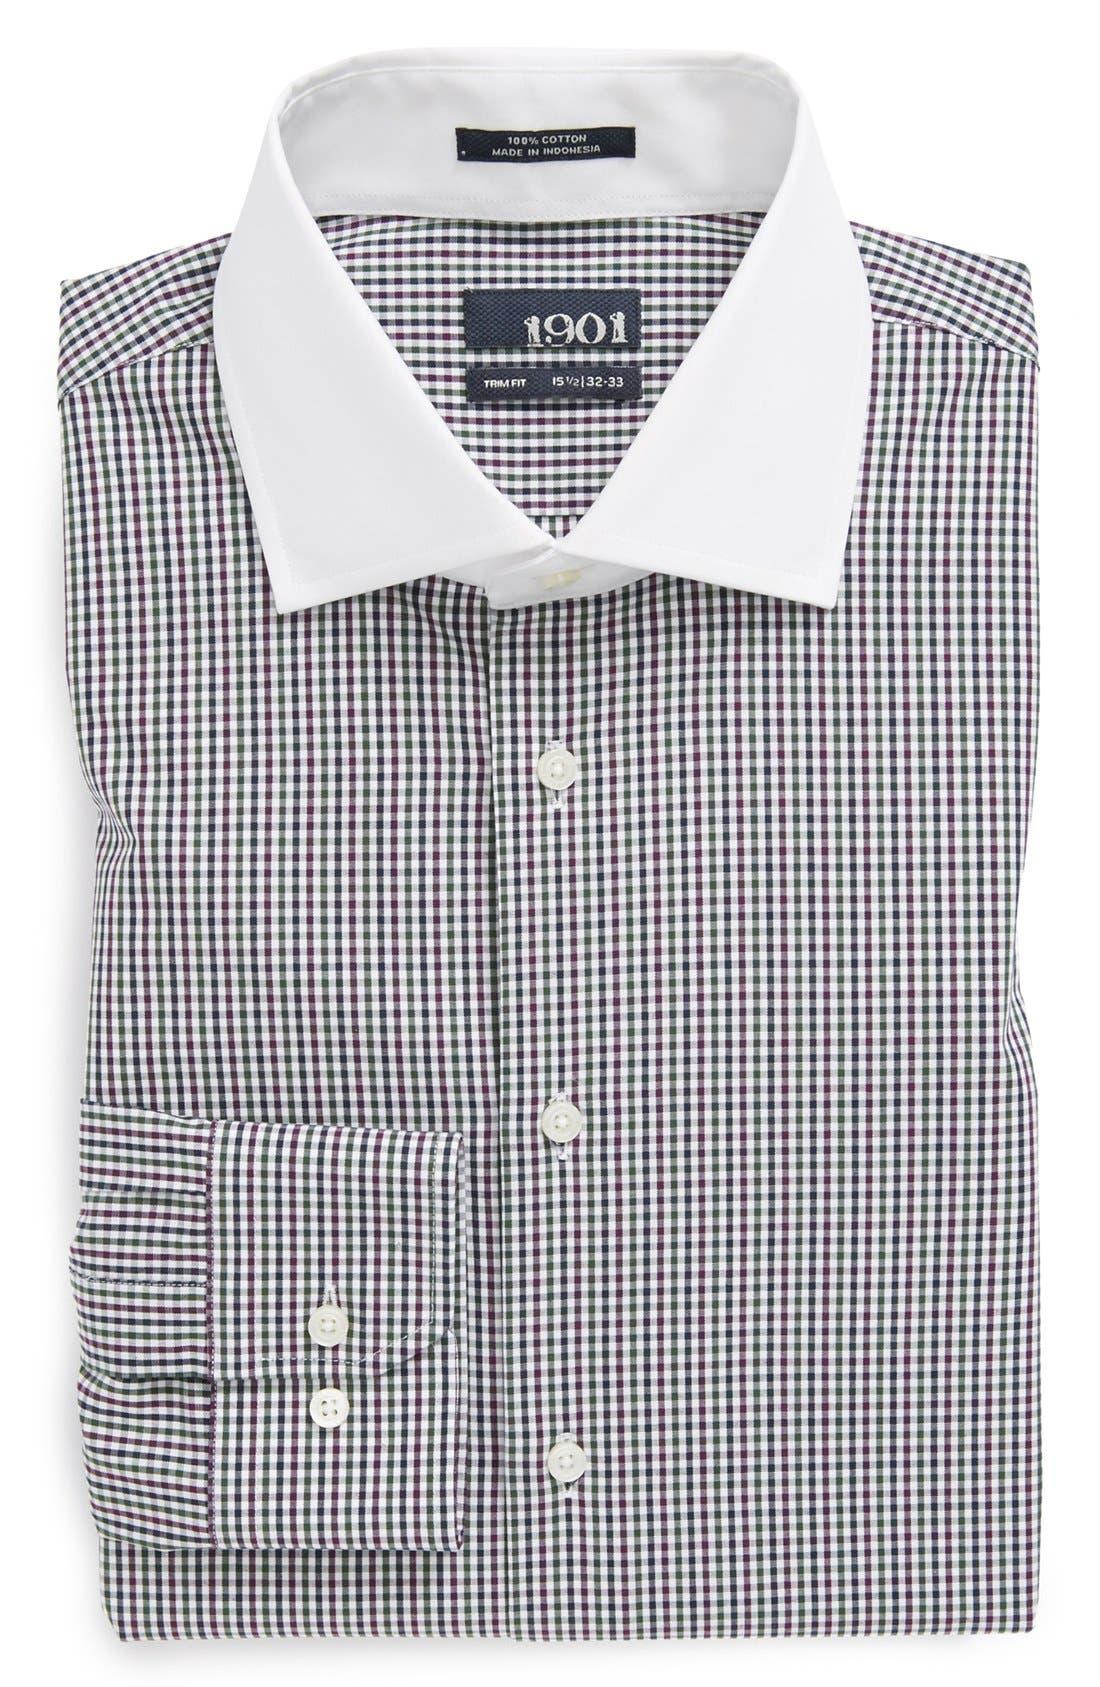 Alternate Image 1 Selected - 1901 Trim Fit Gingham Dress Shirt